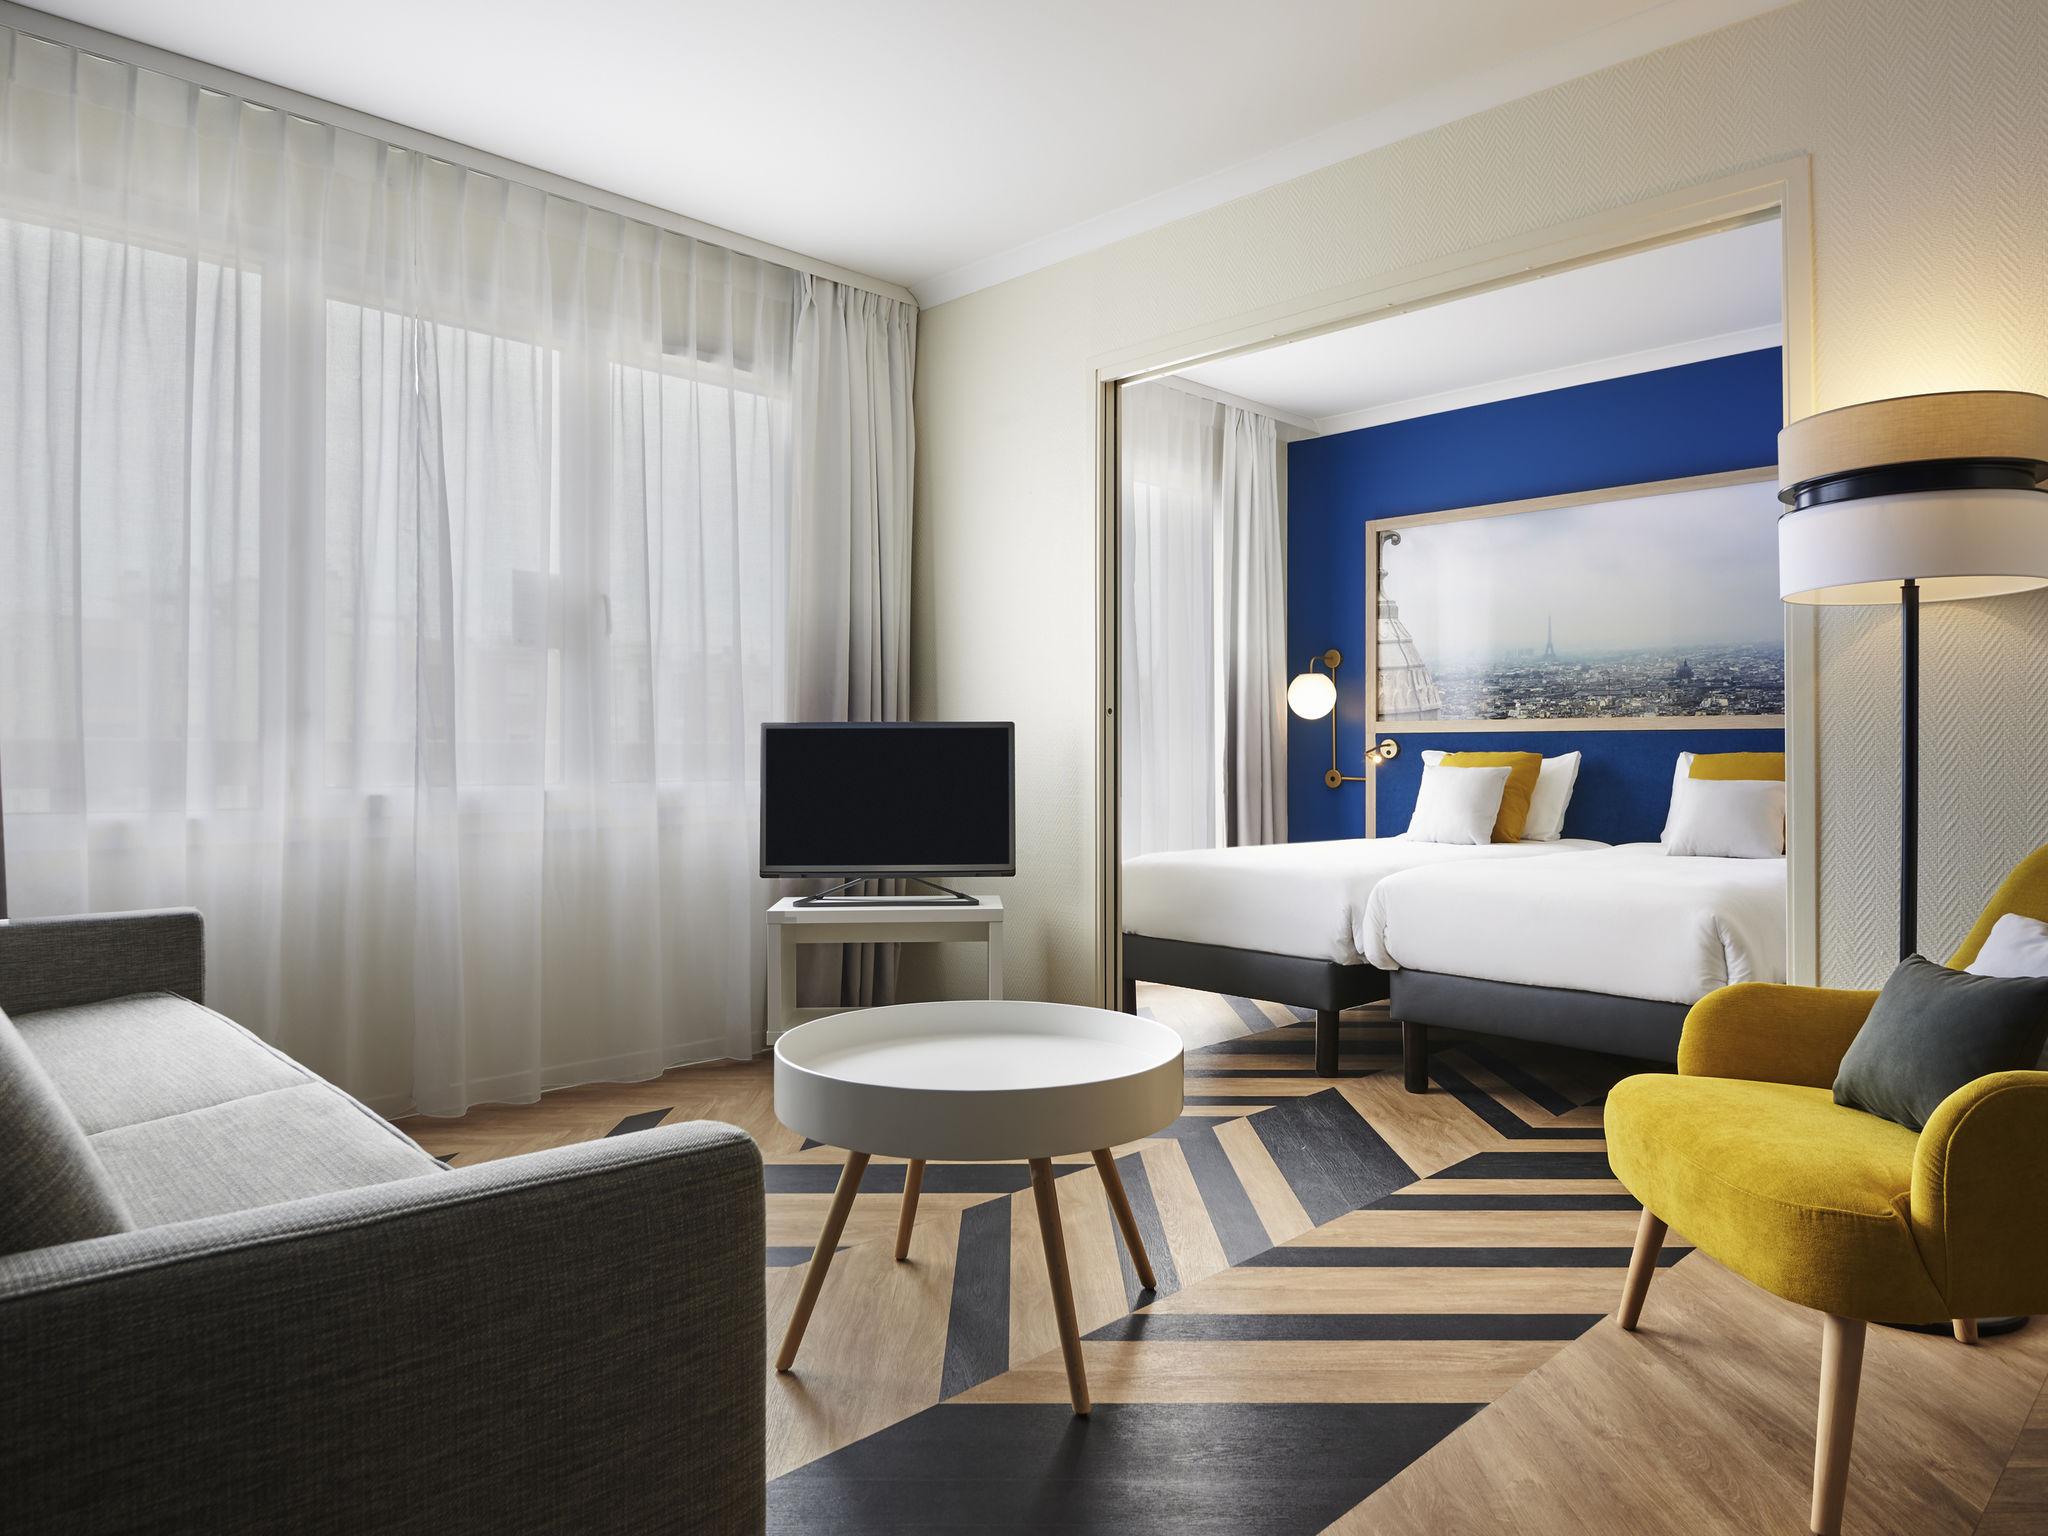 h tel issy les moulineaux aparthotel adagio porte de. Black Bedroom Furniture Sets. Home Design Ideas